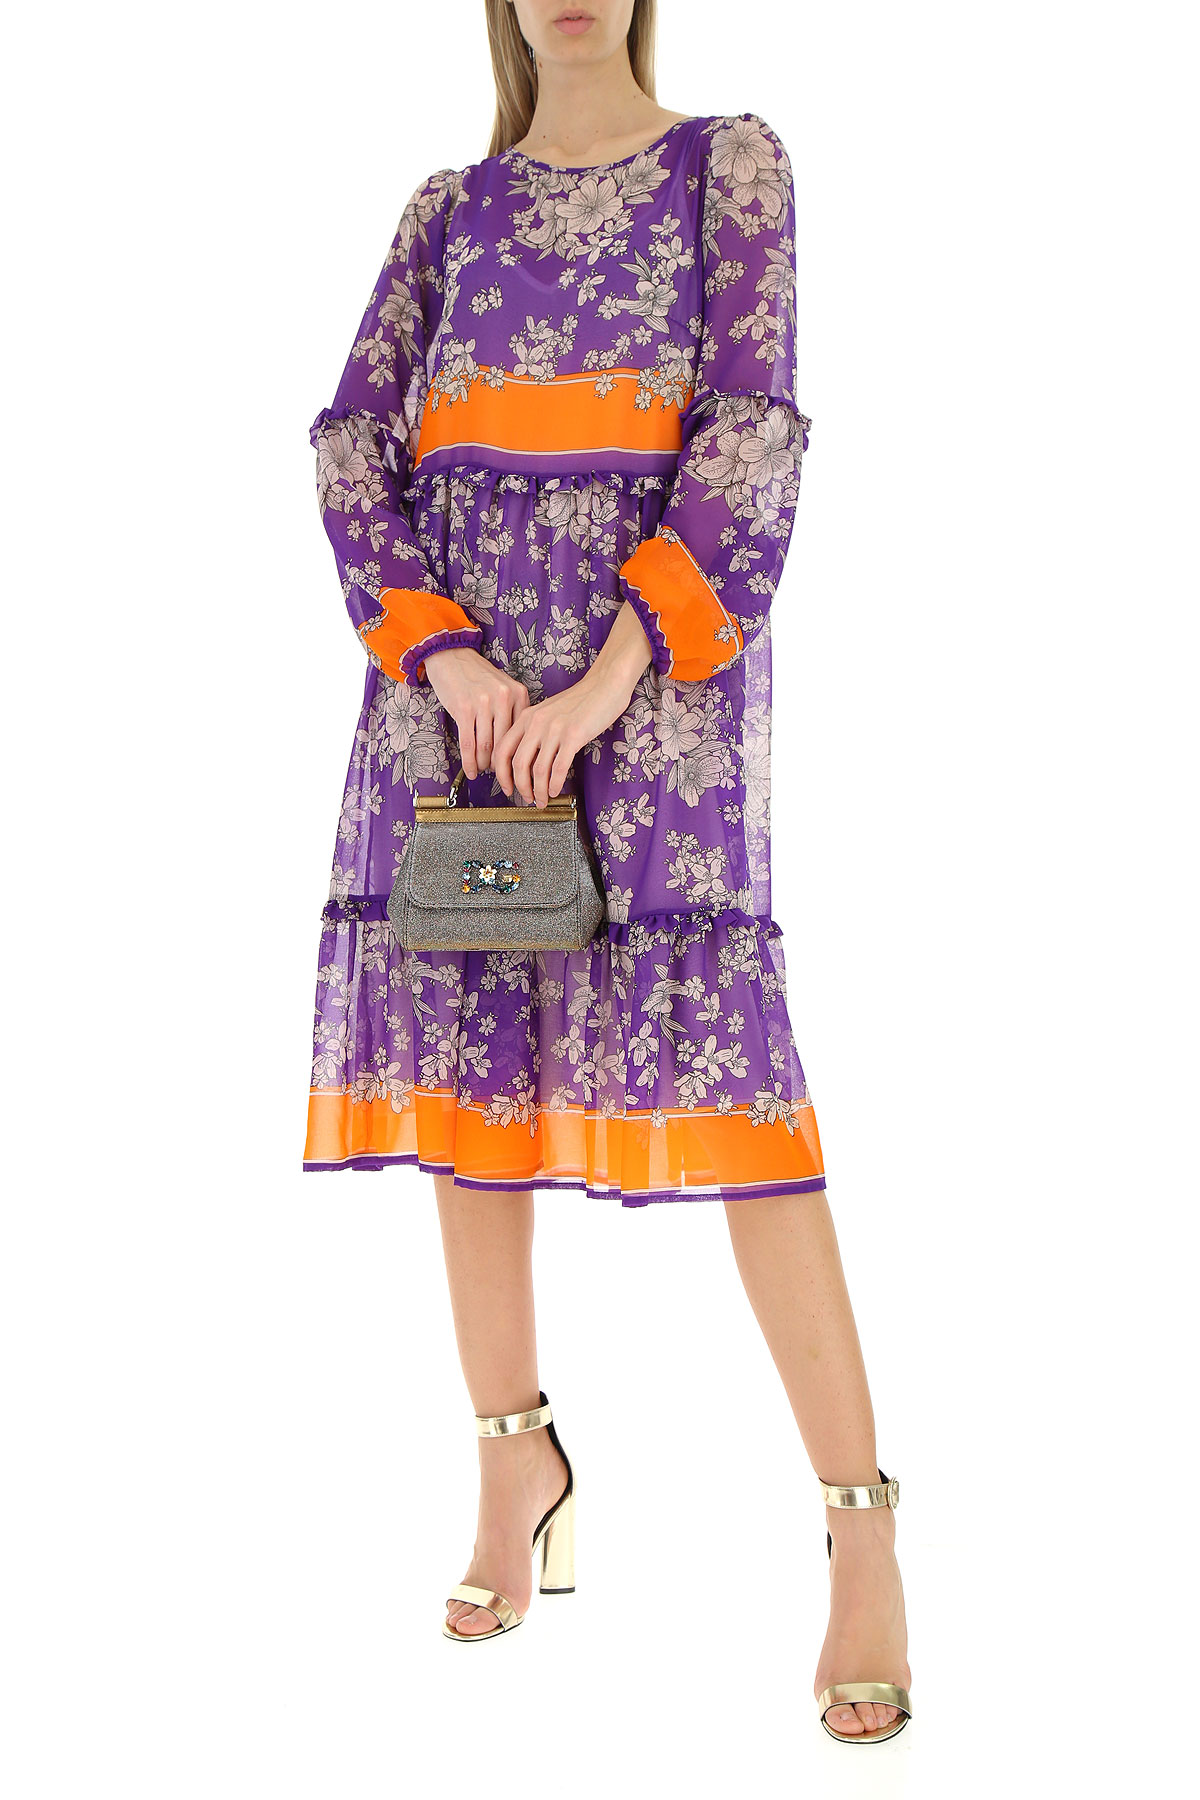 verano a r h Violeta Ropa s Naranja 2019 Primavera o Mujer P Para 1pqwzUUx